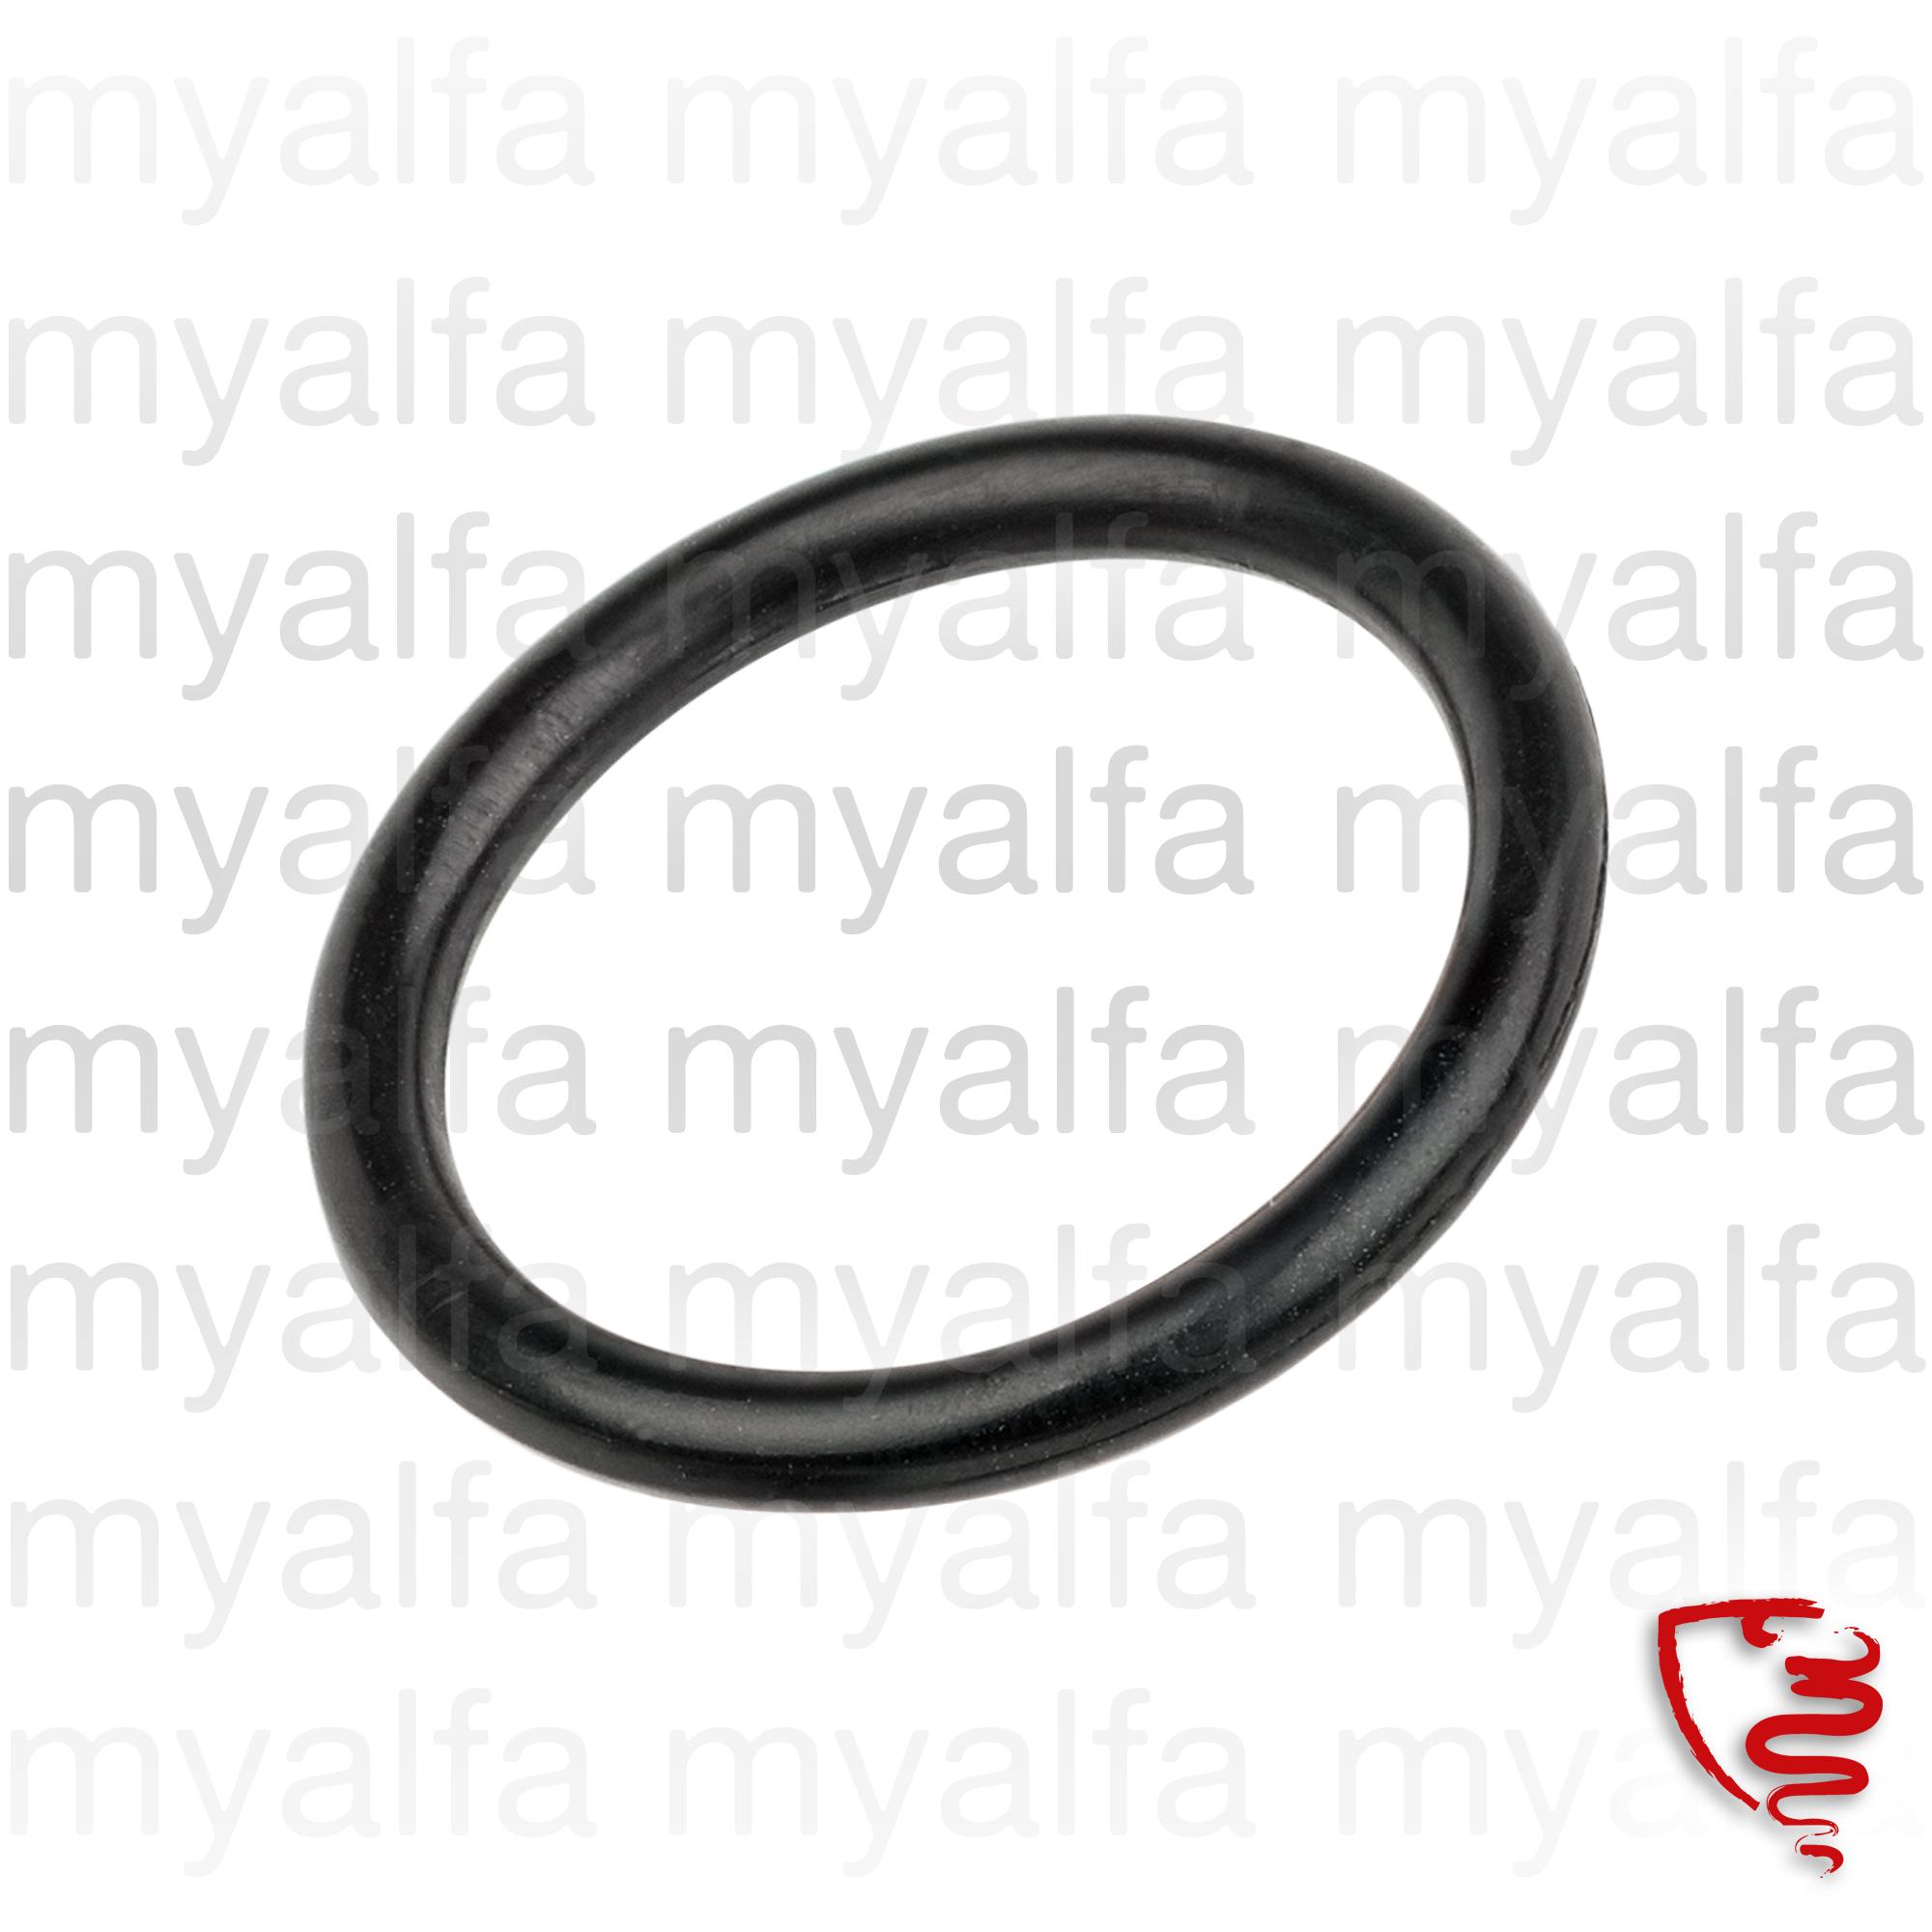 Seal (O-ring) distribution for 105/115, Engine, Engine Gaskets, Engine Block Gaskets